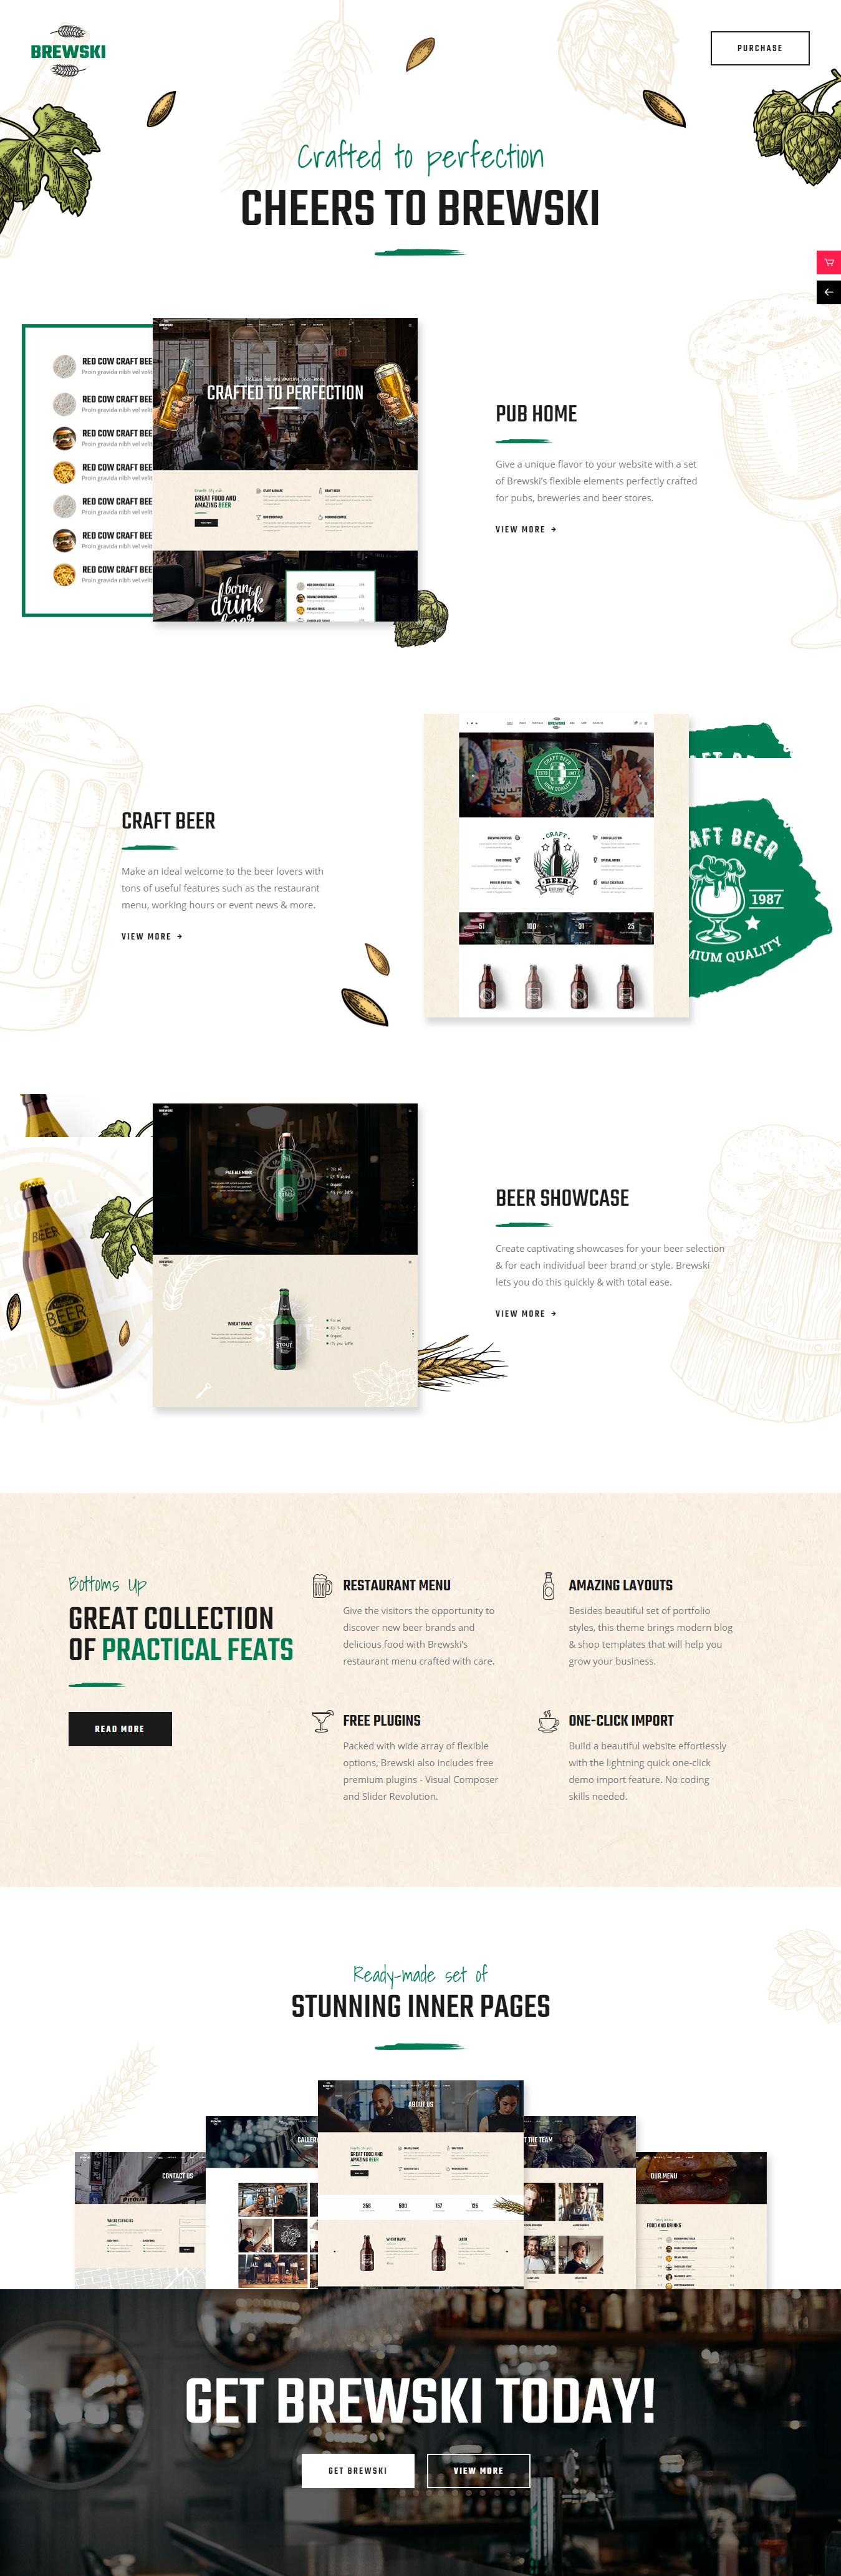 Brewski - Best Premium Bar and Pub WordPress Theme